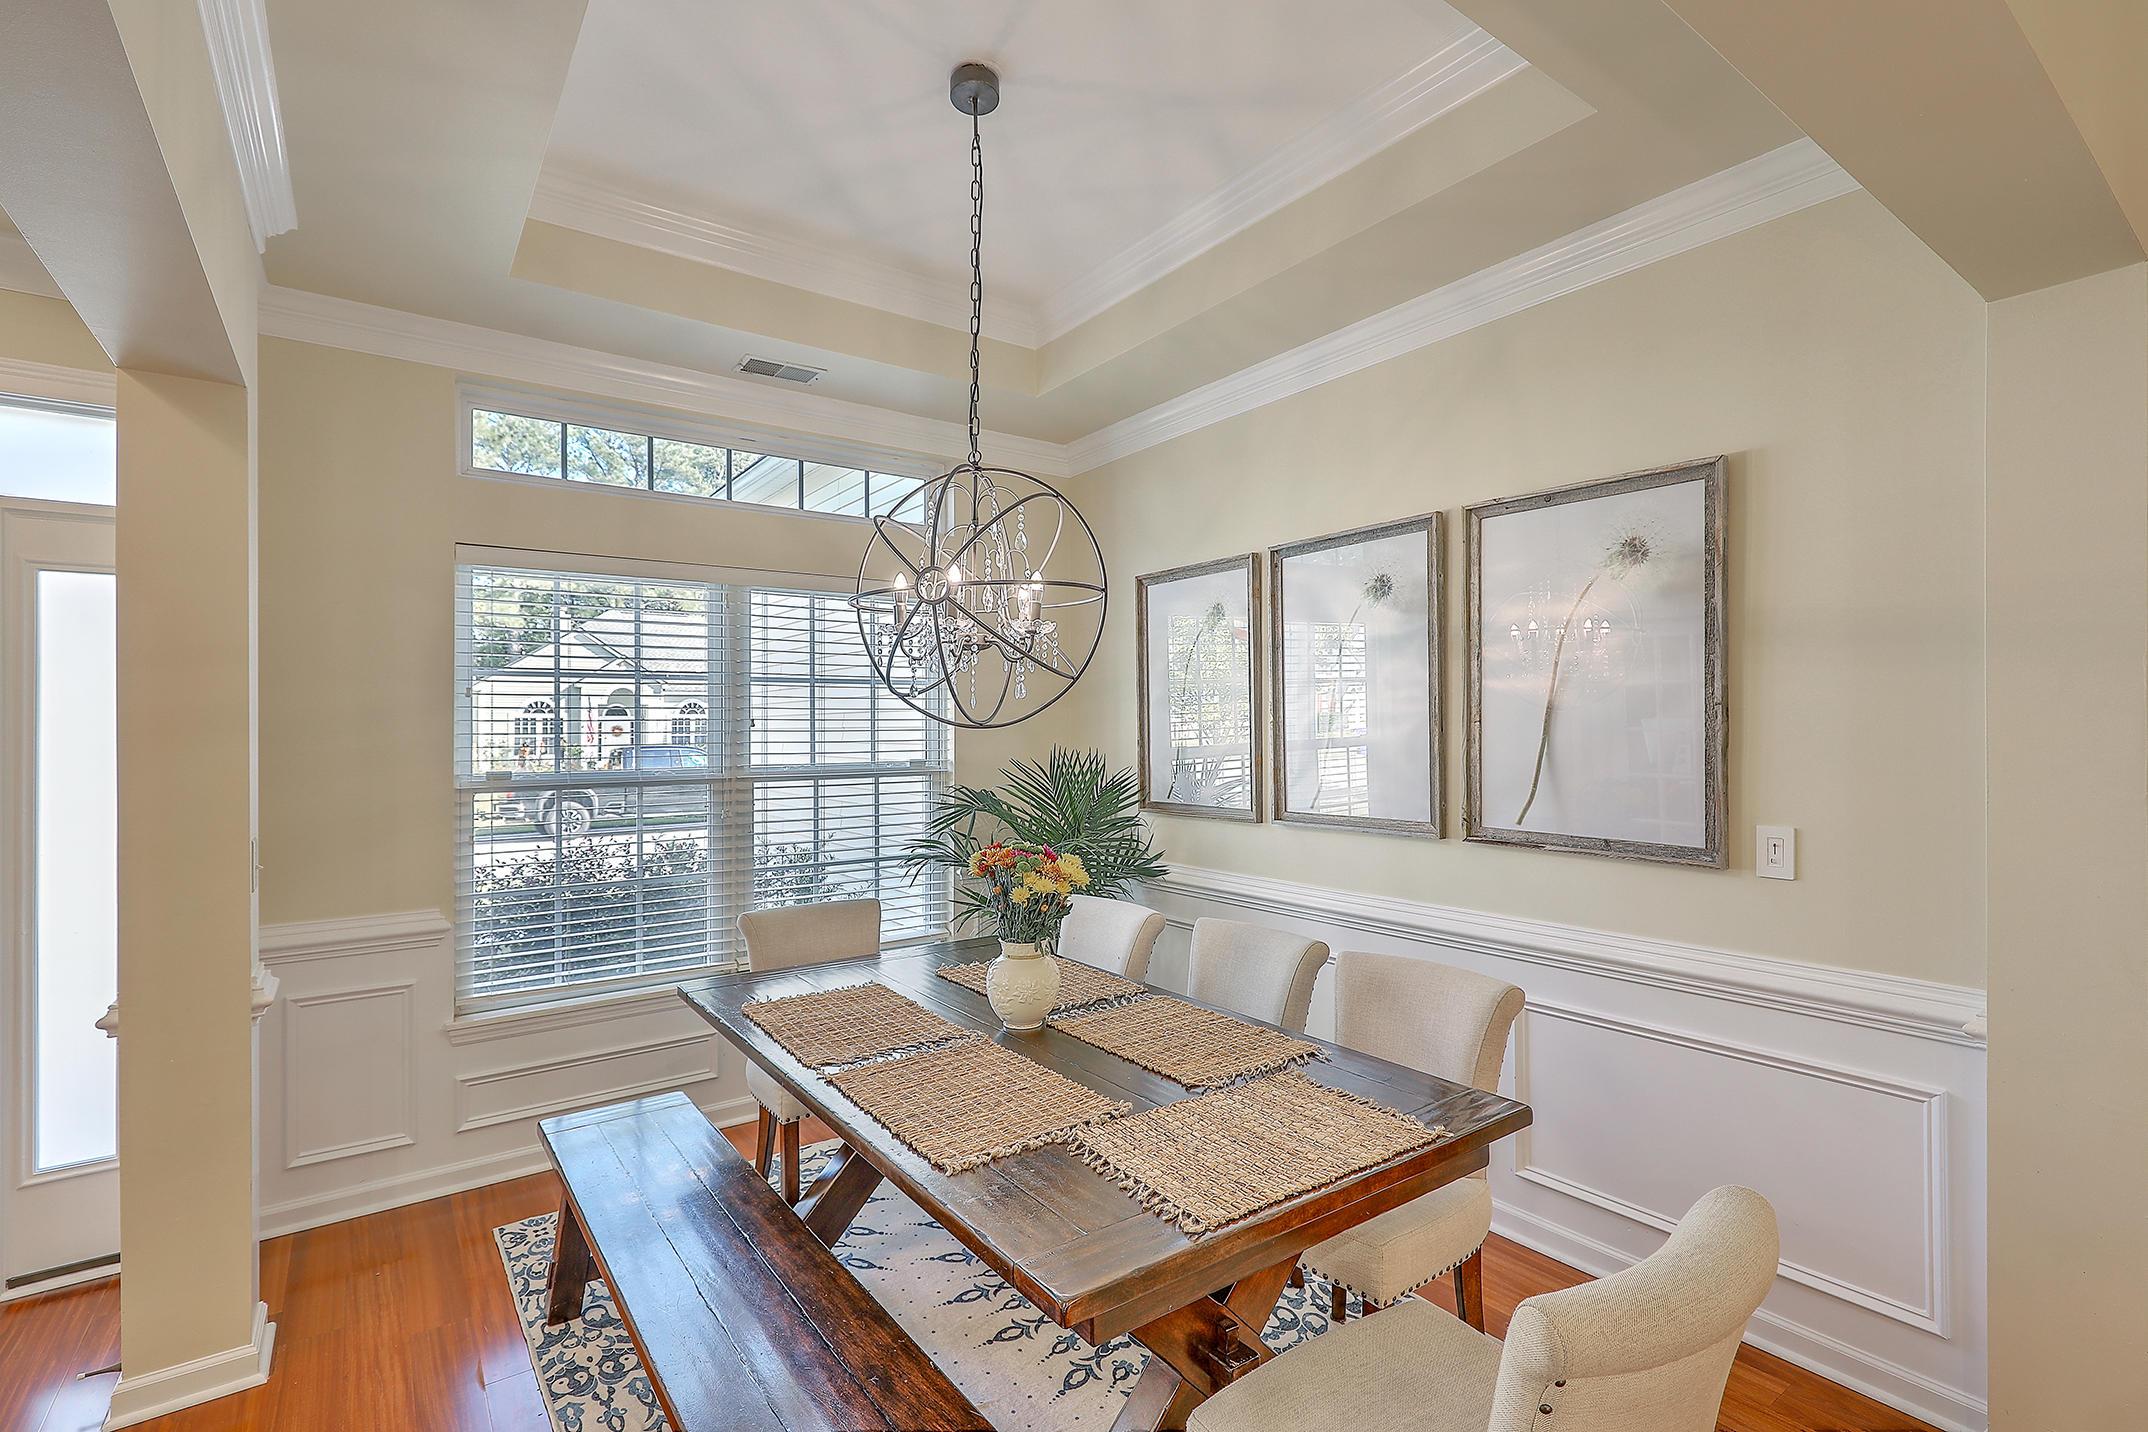 Dunes West Homes For Sale - 1471 Cypress Pointe, Mount Pleasant, SC - 27